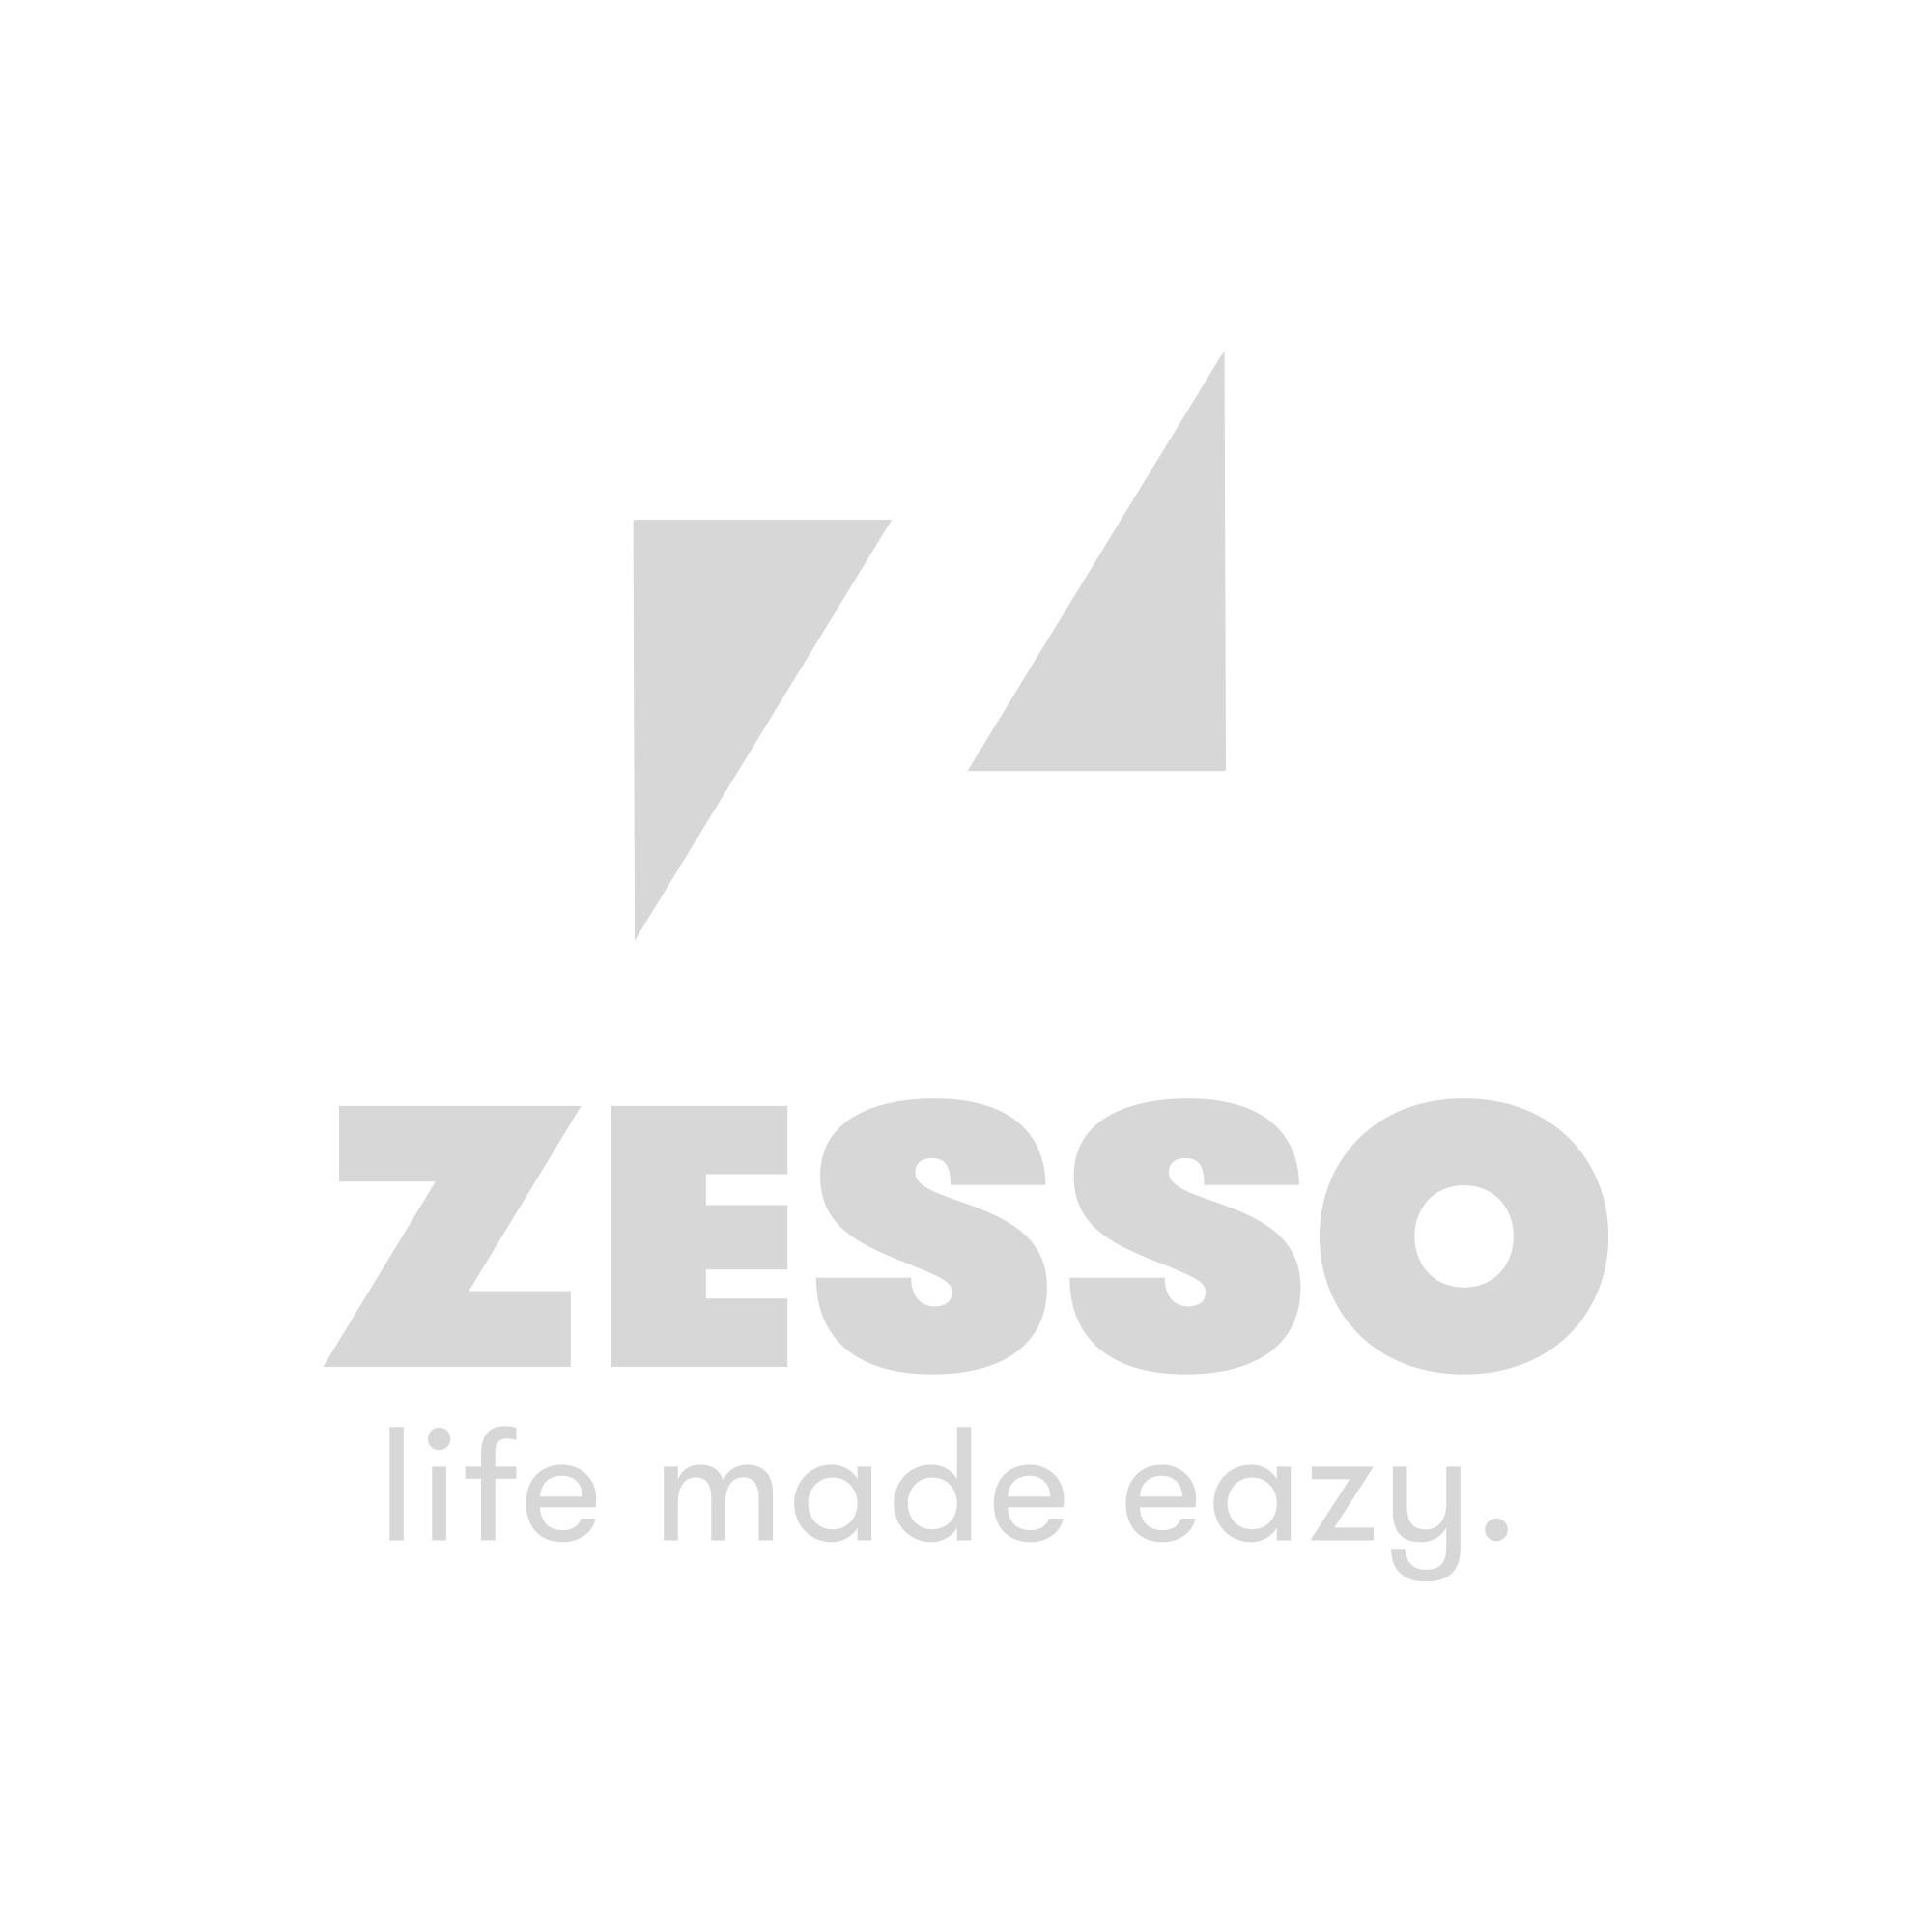 Baytex Canvas Poster Set Pink Sea 30 cm x 40 cm - 3 Stuks